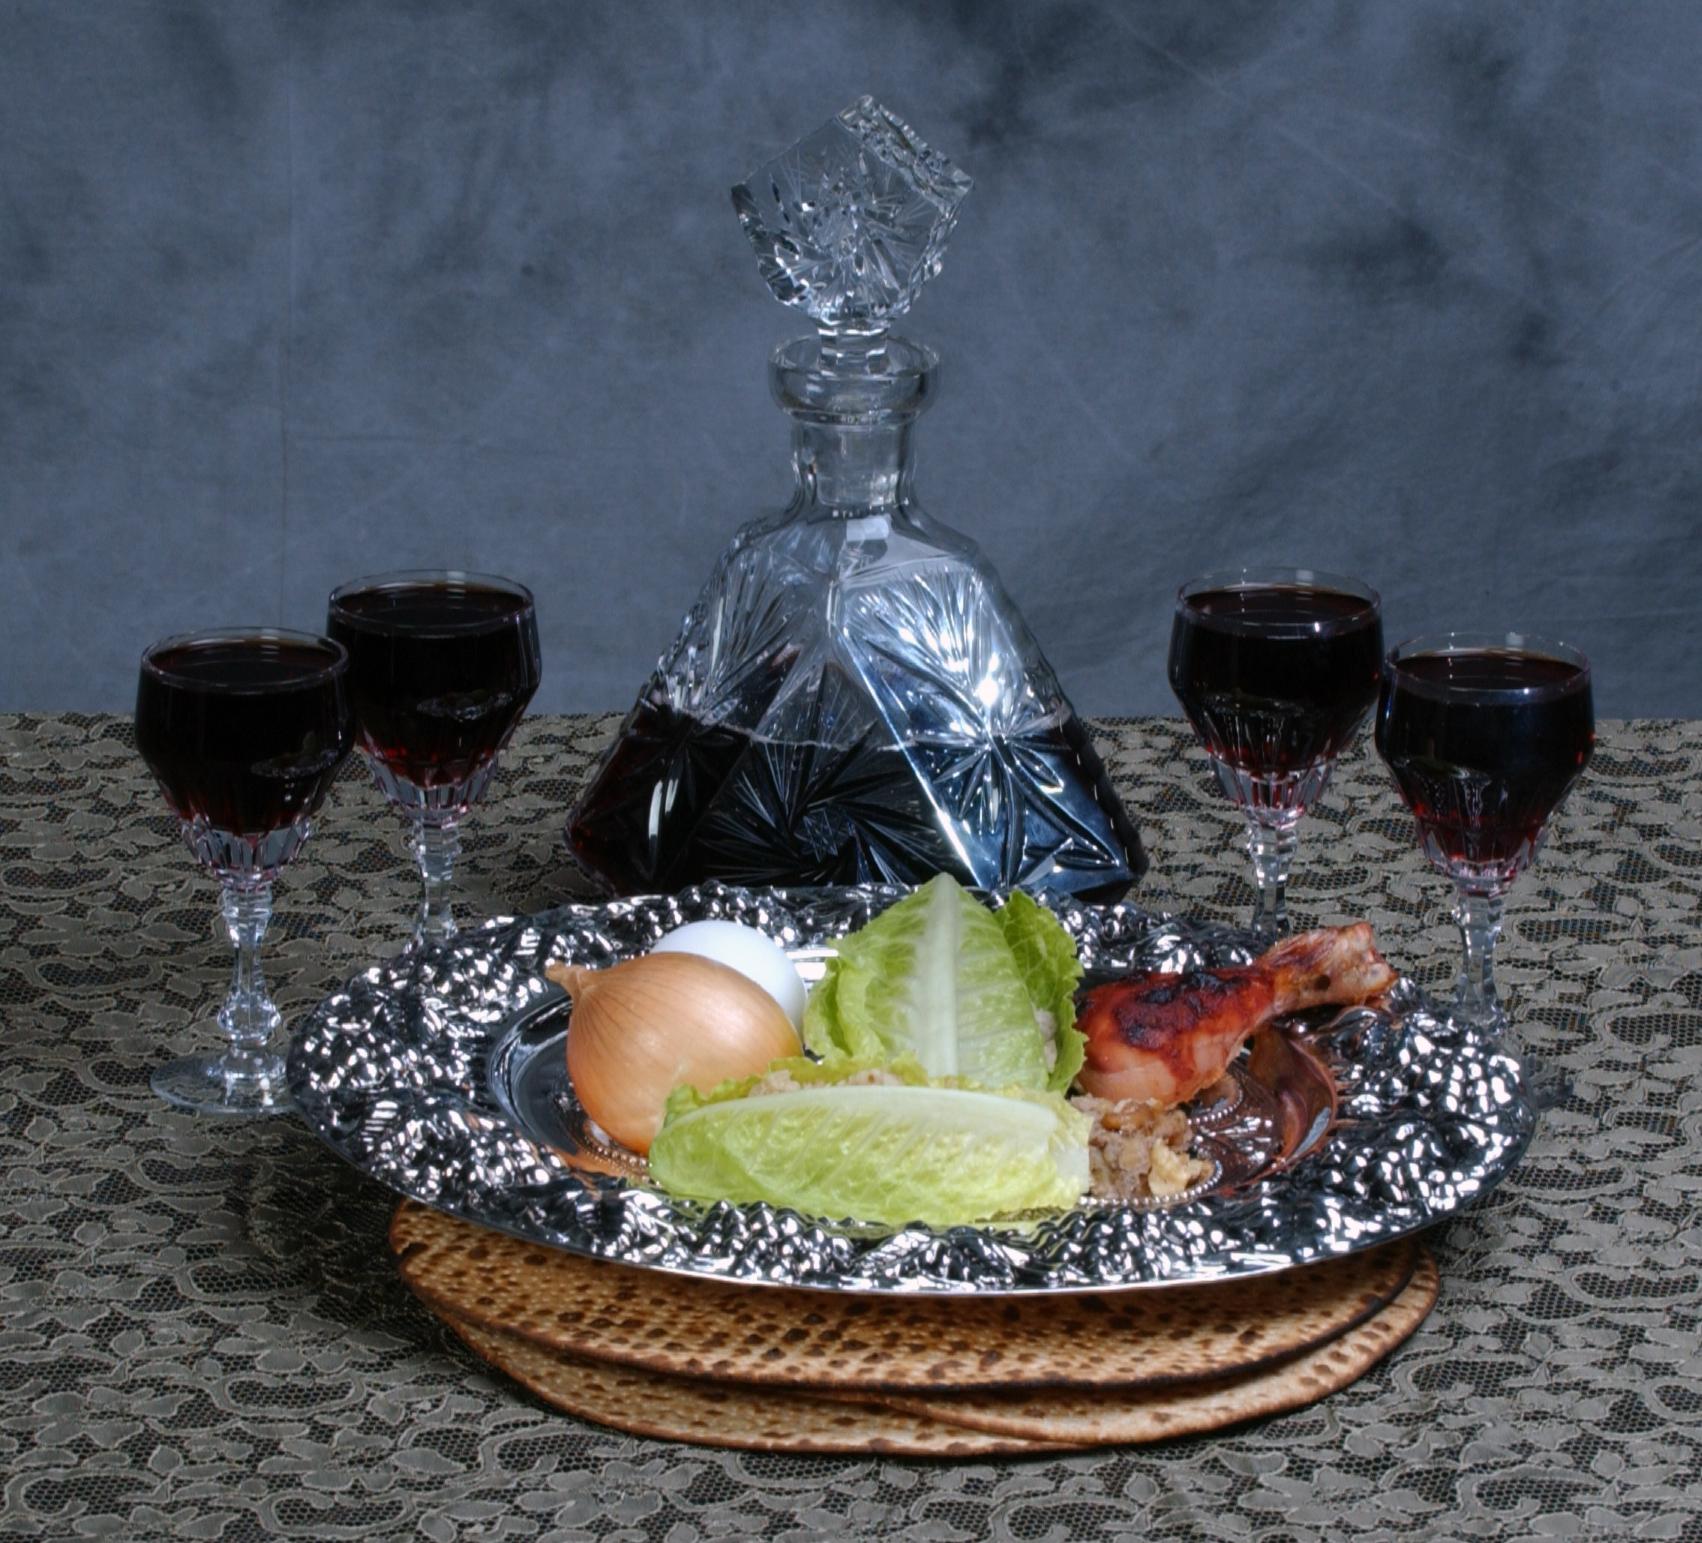 passover-series-the-seder-1-1528687.jpg